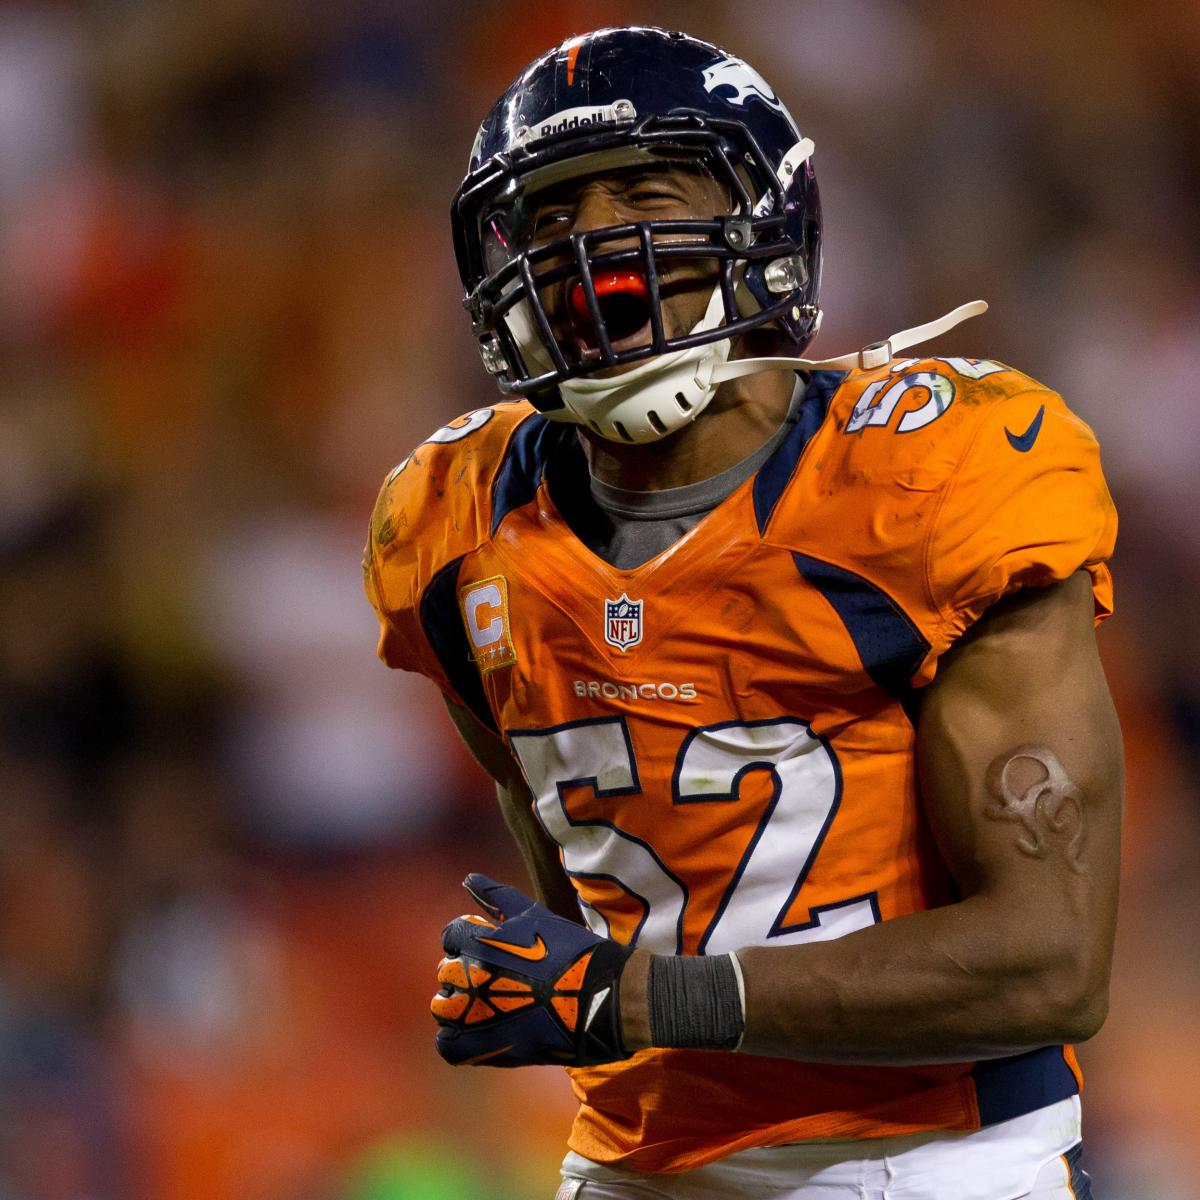 Denver News I 25: Texans Vs. Broncos: The Broncos' Biggest Winners And